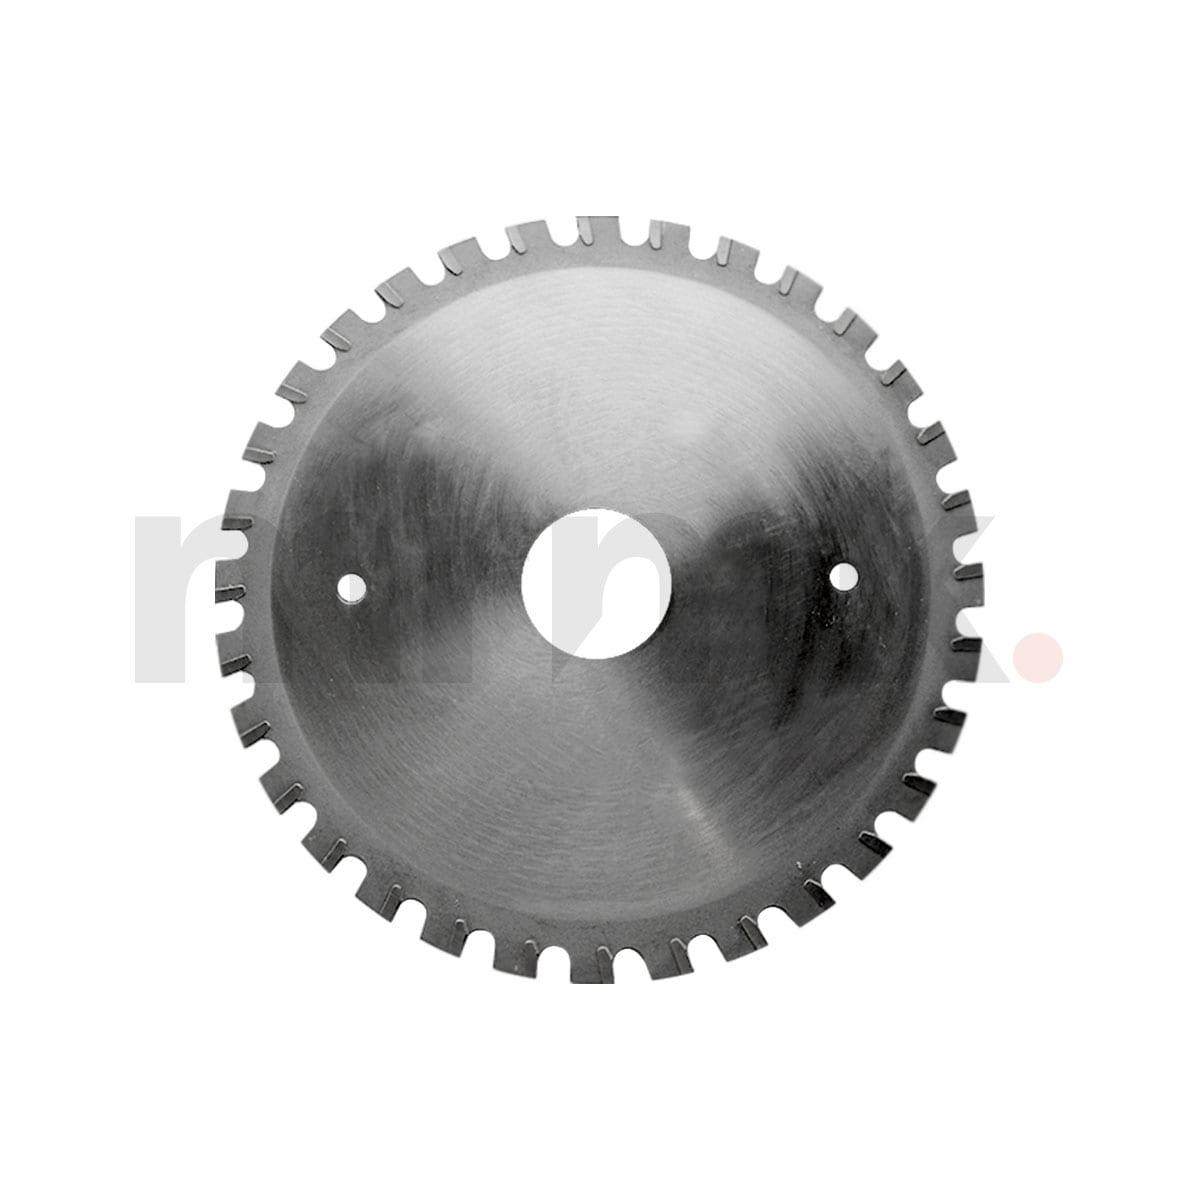 FREUND Compatible Circular Knives 2